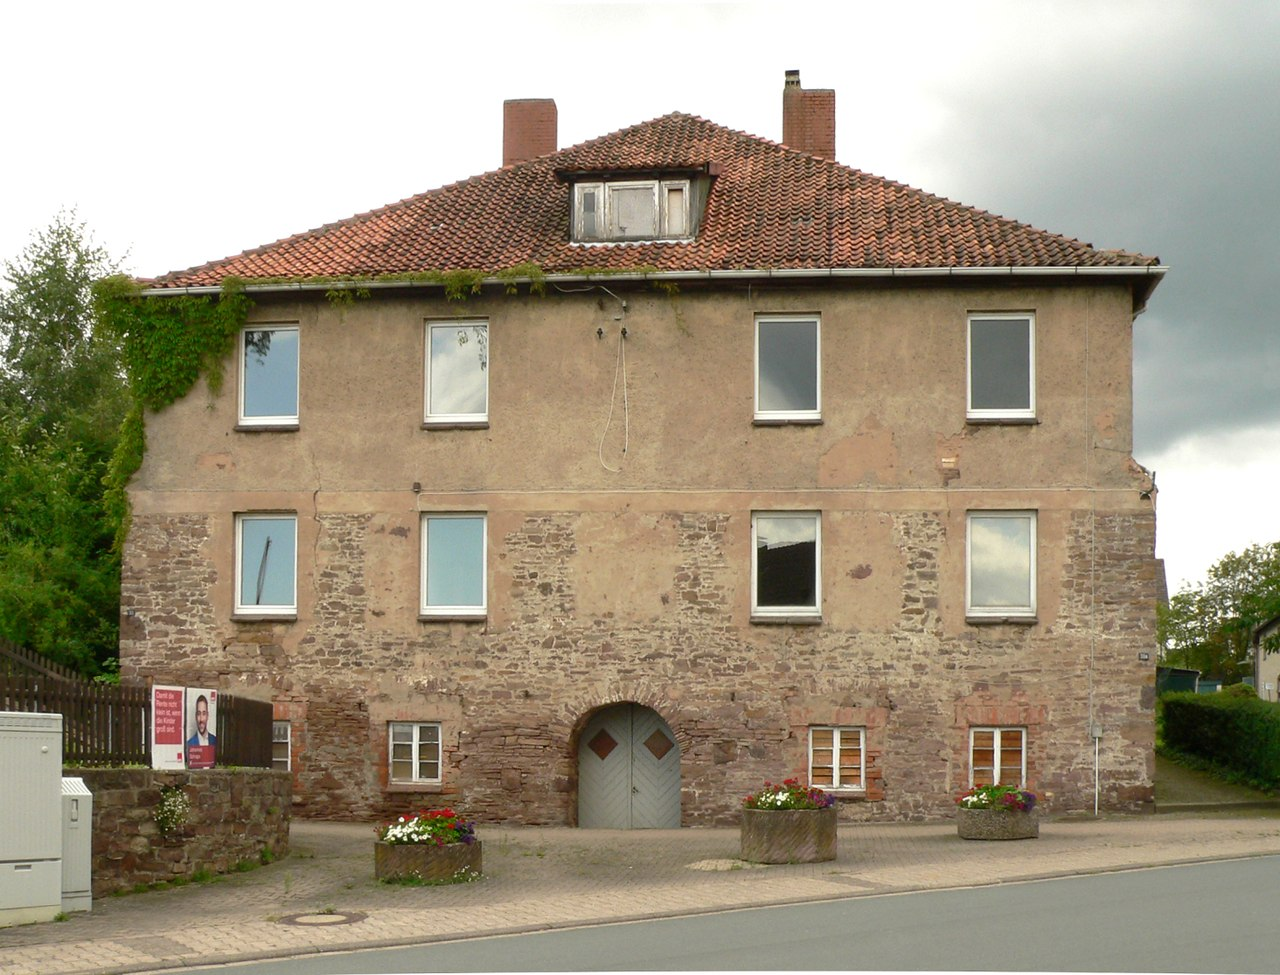 Fassade frontal  File:Fürstenberg Altes Brennhaus Fassade frontal.jpg - Wikimedia ...